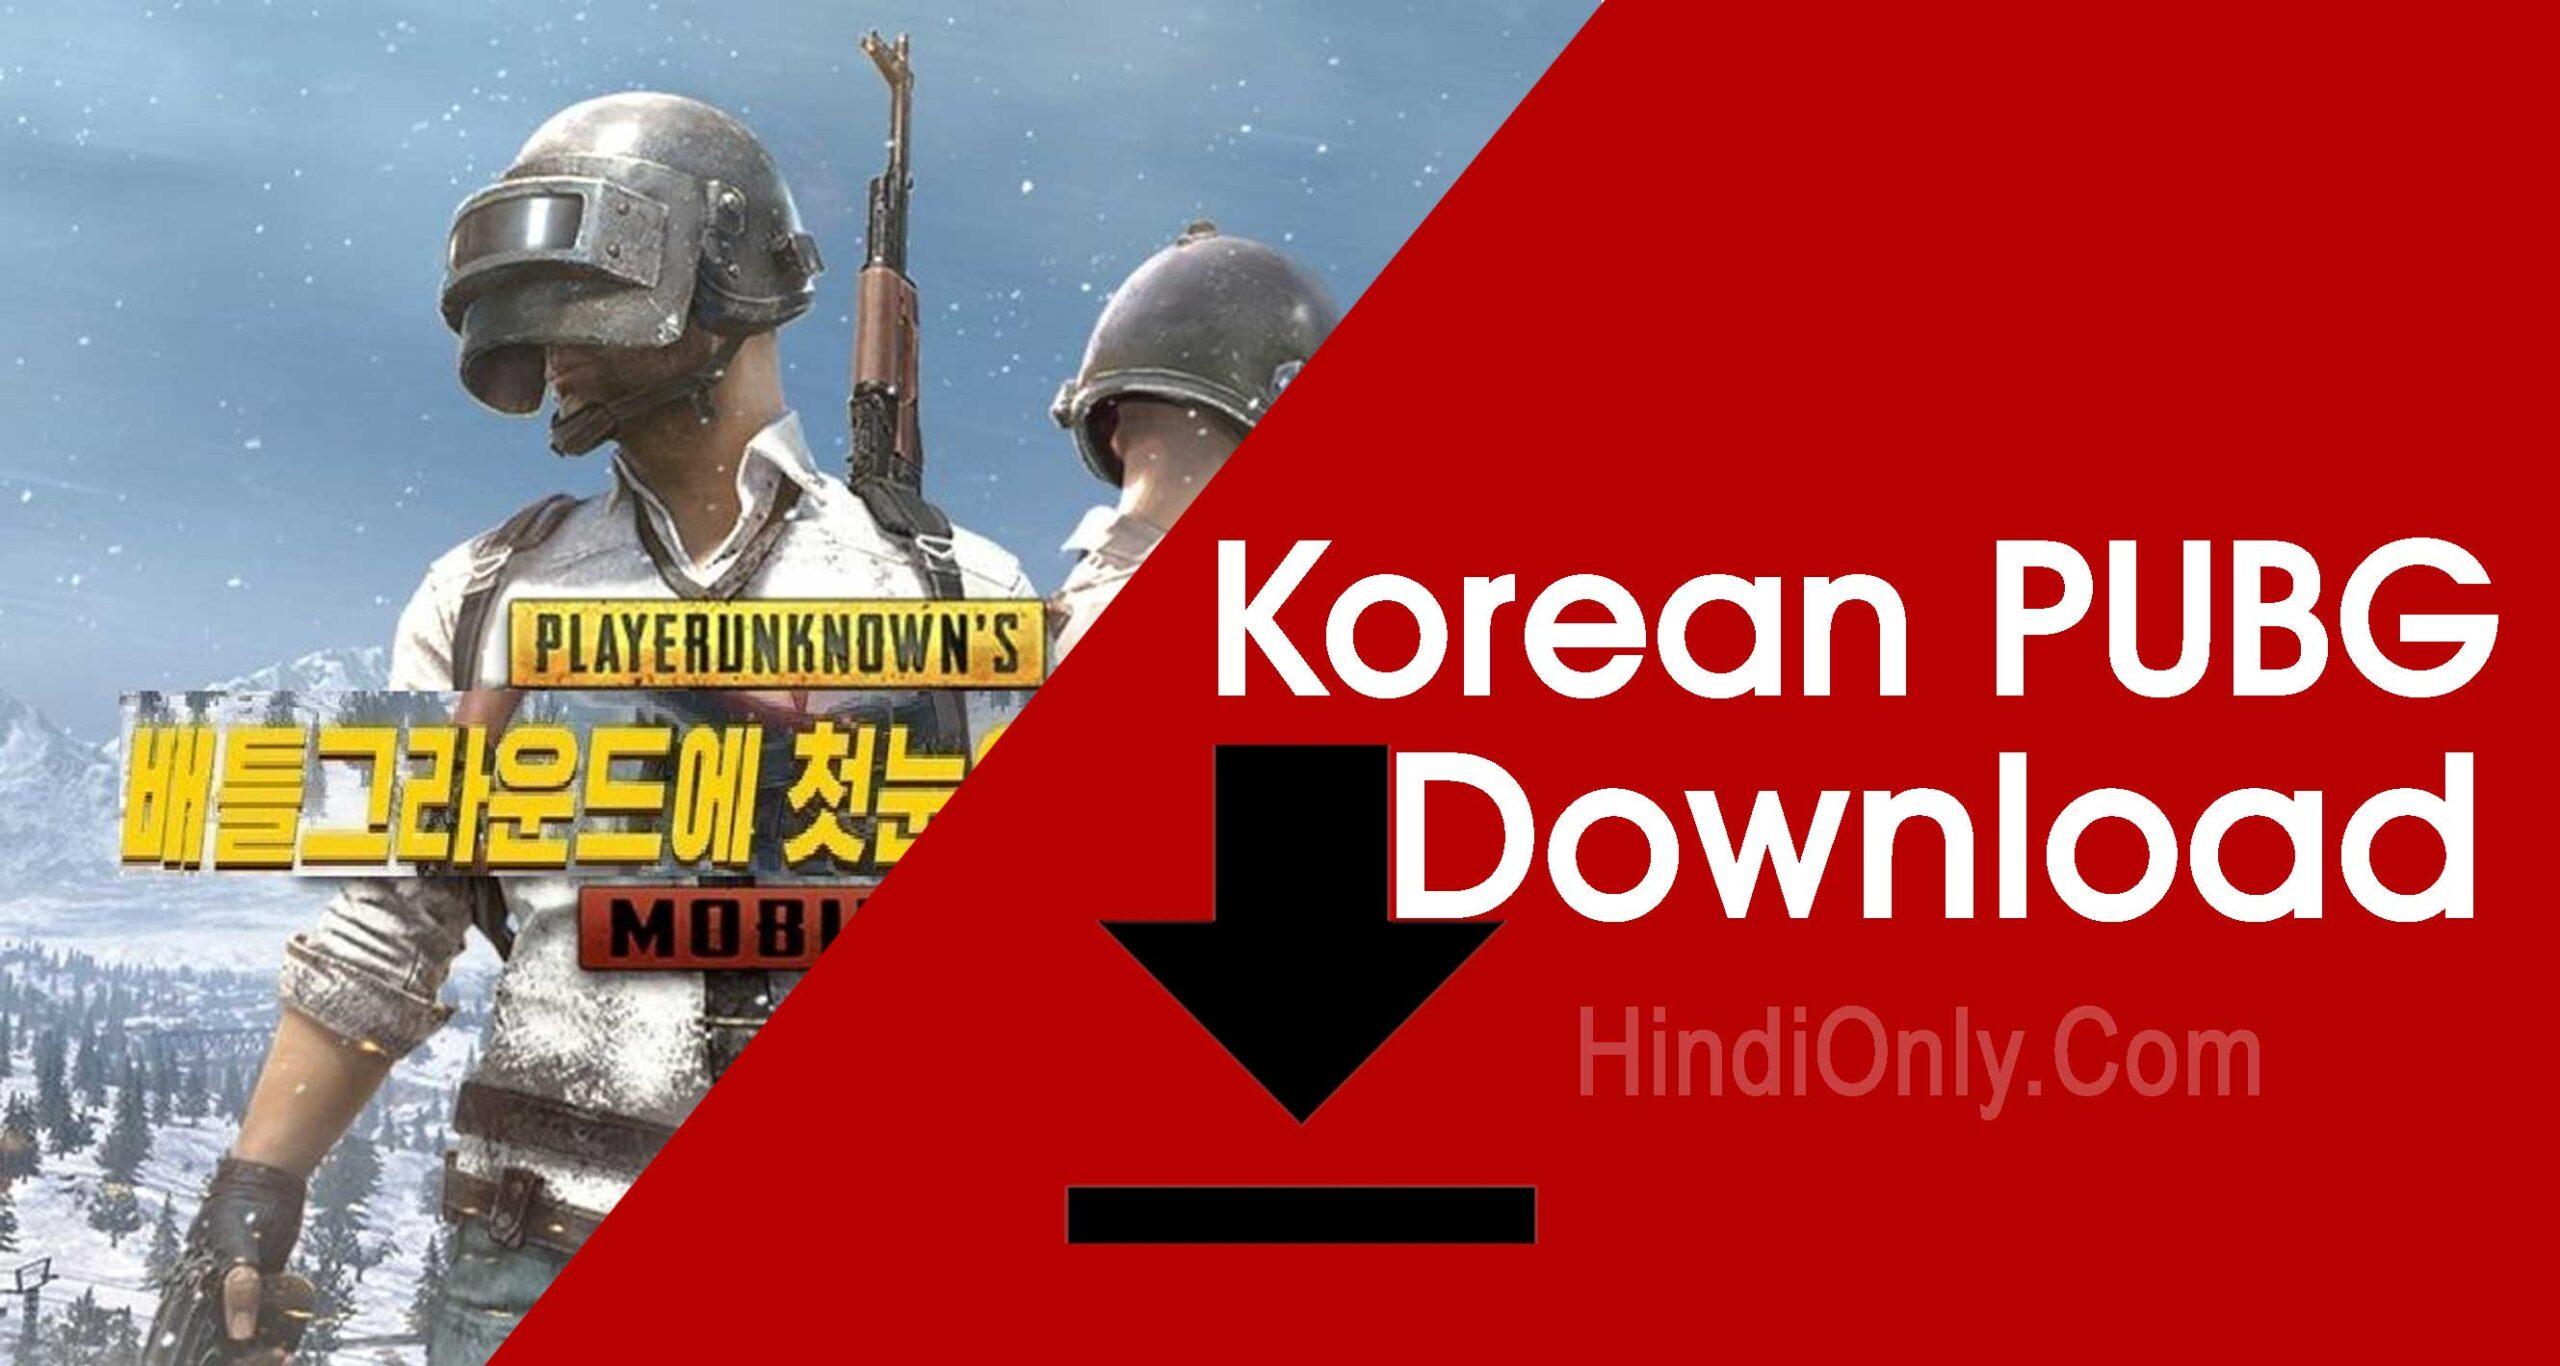 Korean PUBG Download कैसे करे